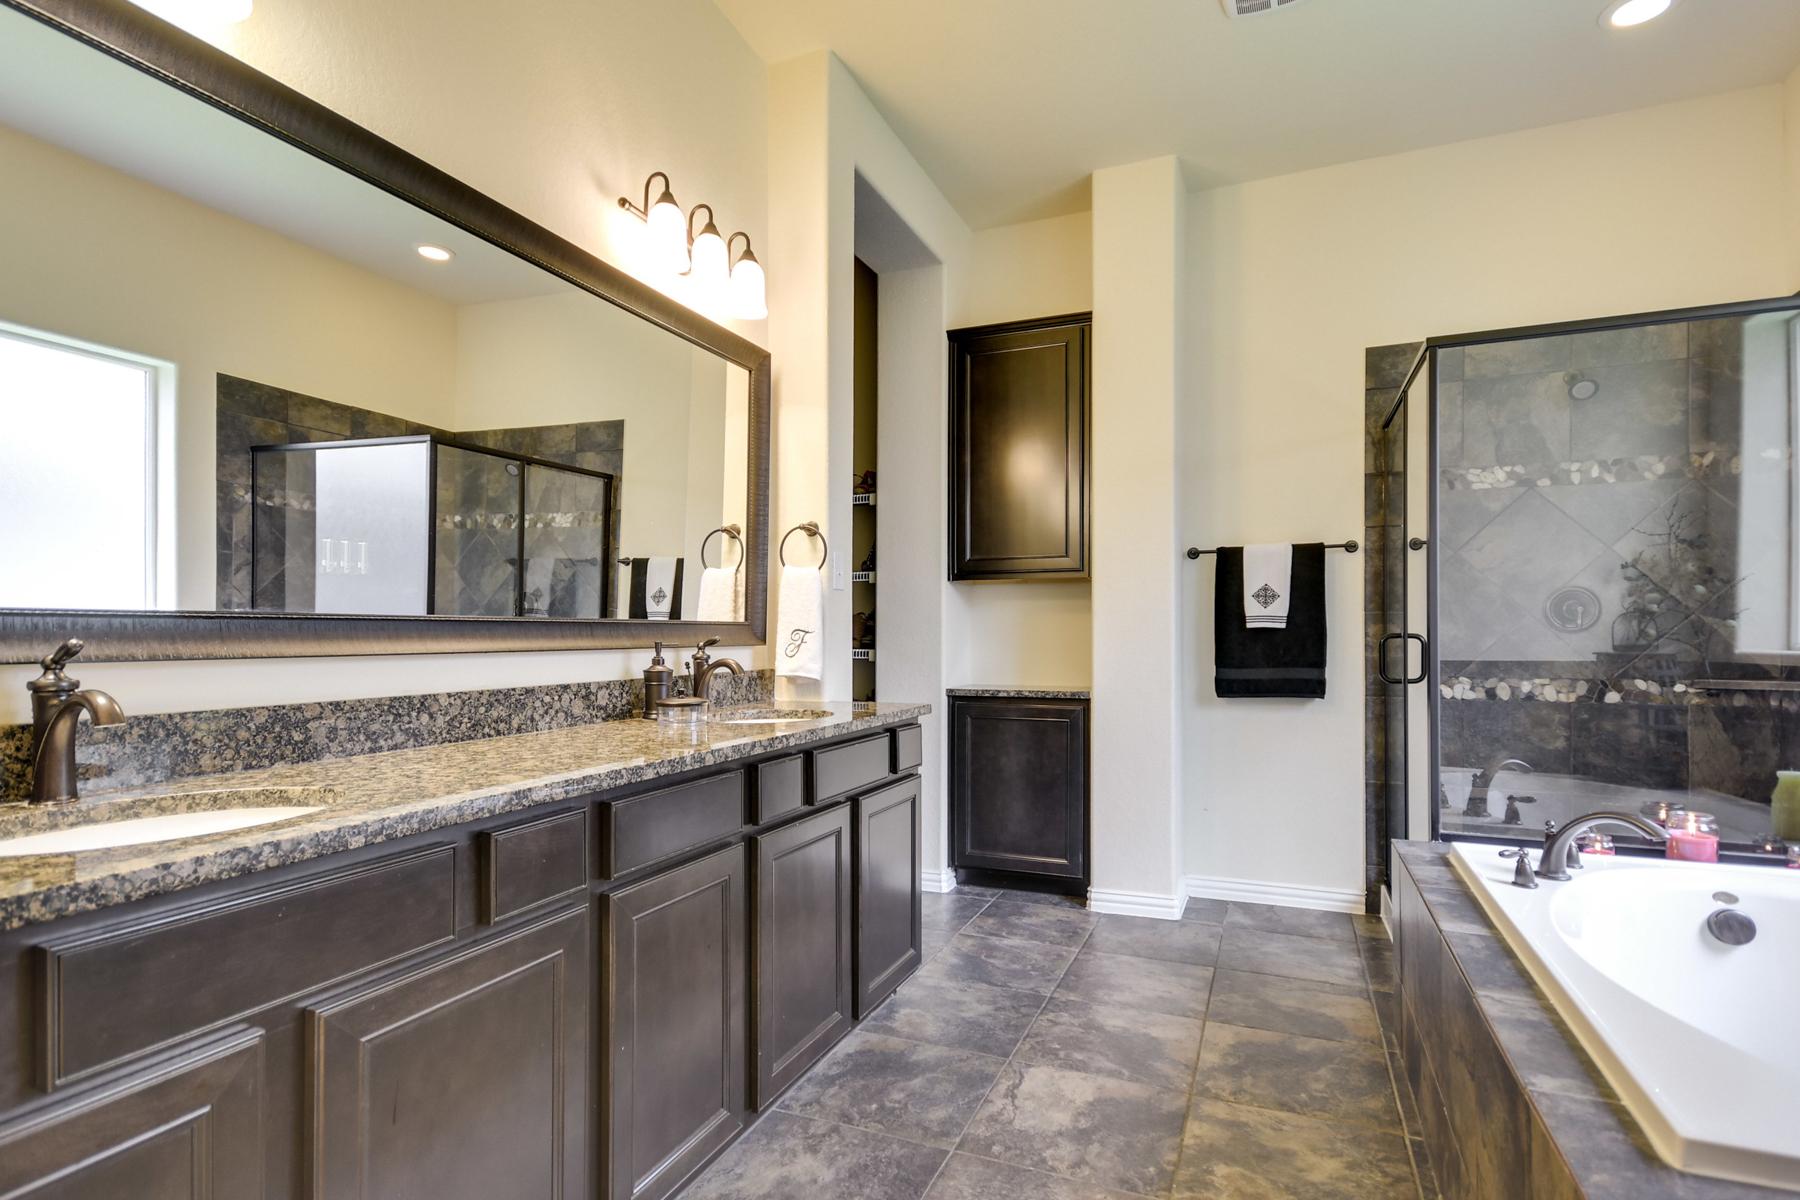 Additional photo for property listing at Beautiful Home in The Preserve at Alamo Ranch 3022 Colorado Cv San Antonio, Texas 78253 Estados Unidos